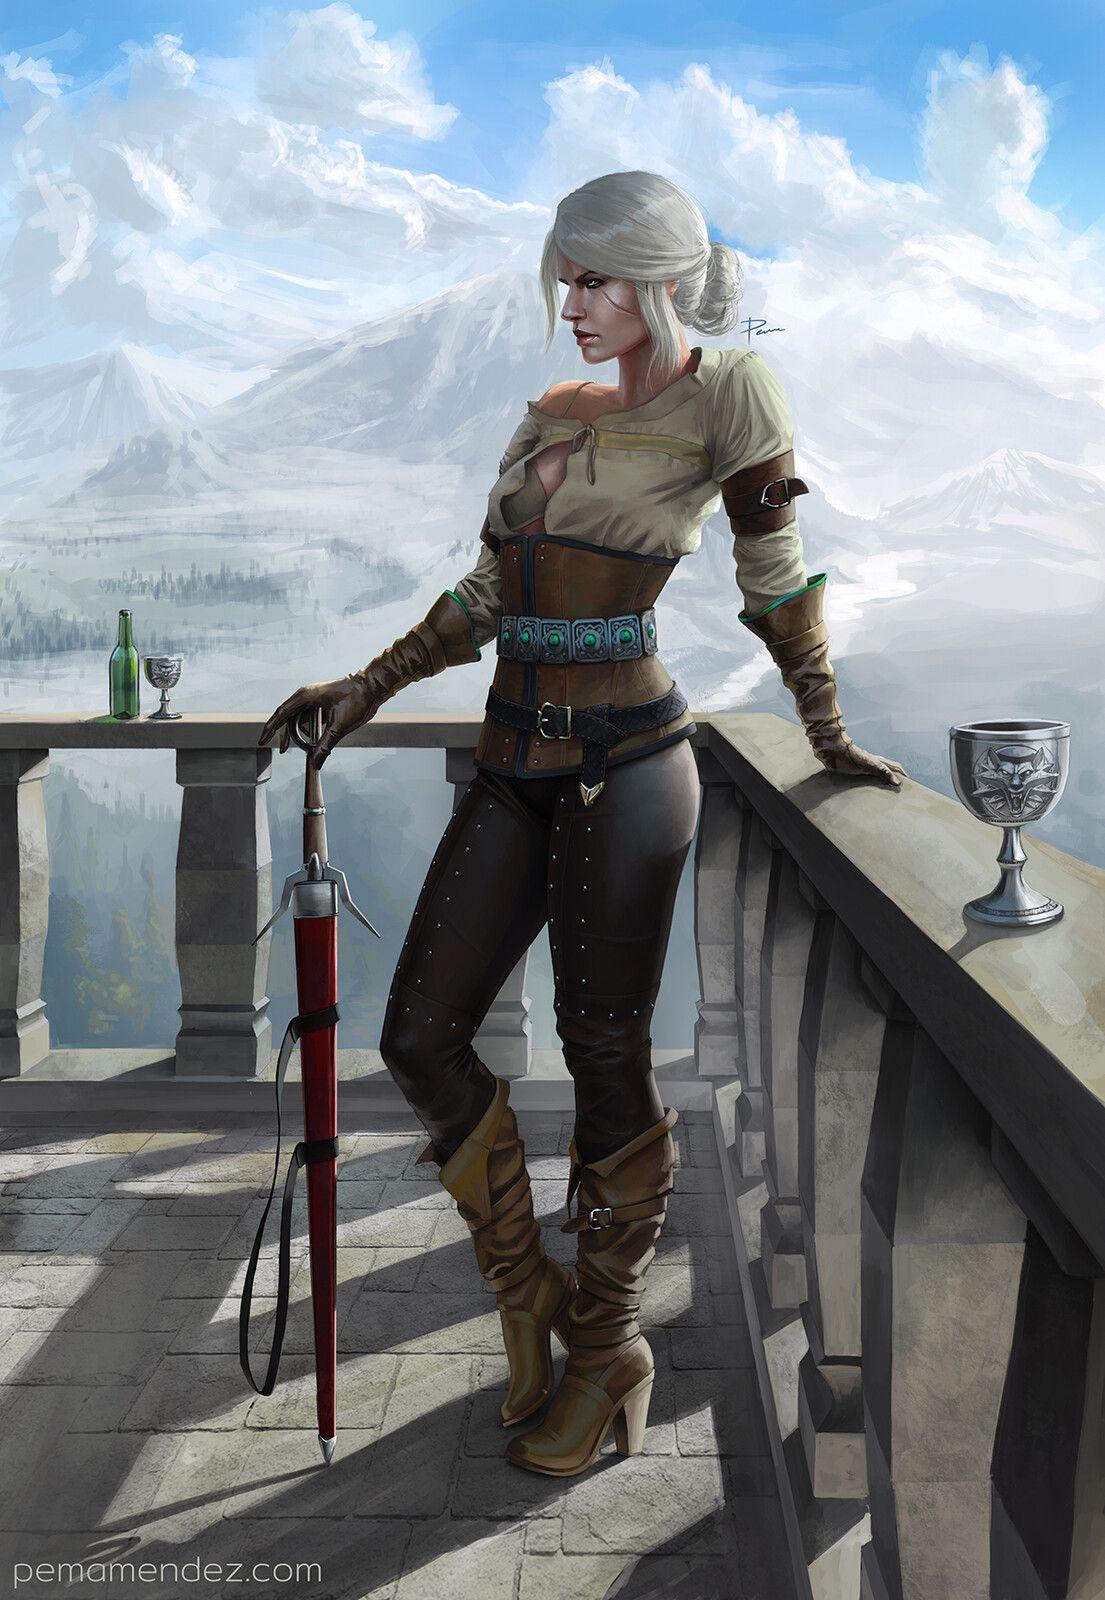 Ciri Emanuel Mendez On Artstation At Https Www Artstation Com Artwork Nqbeyo The Witcher The Witcher Game Ciri Ciri witcher 3 hd games artwork